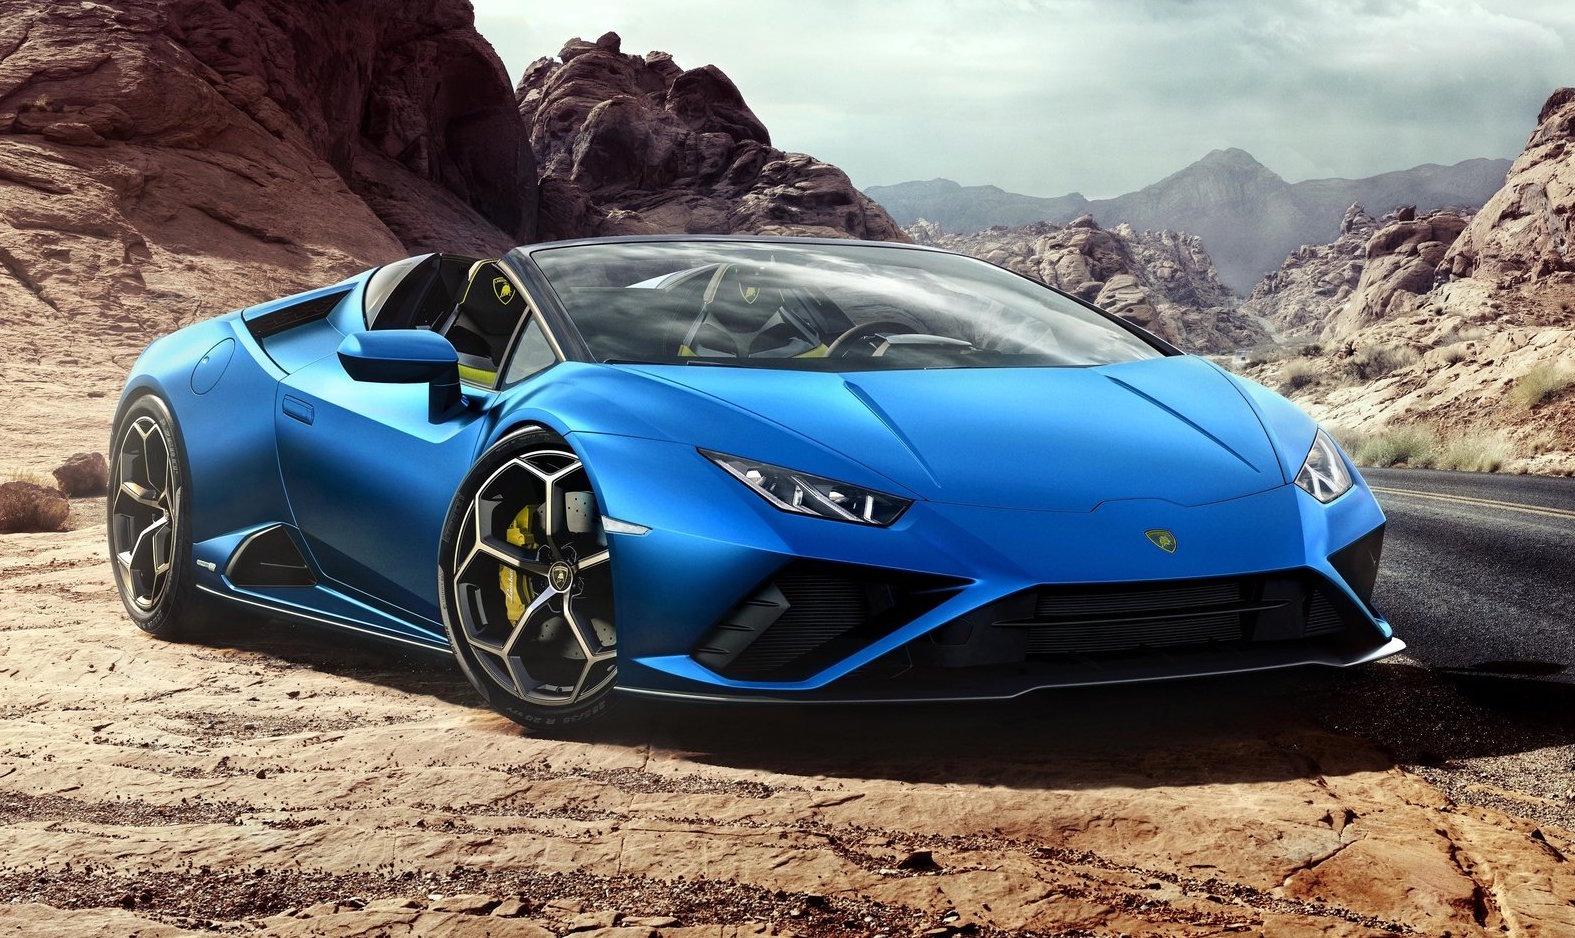 2021 Lamborghini Huracan Concept and Review